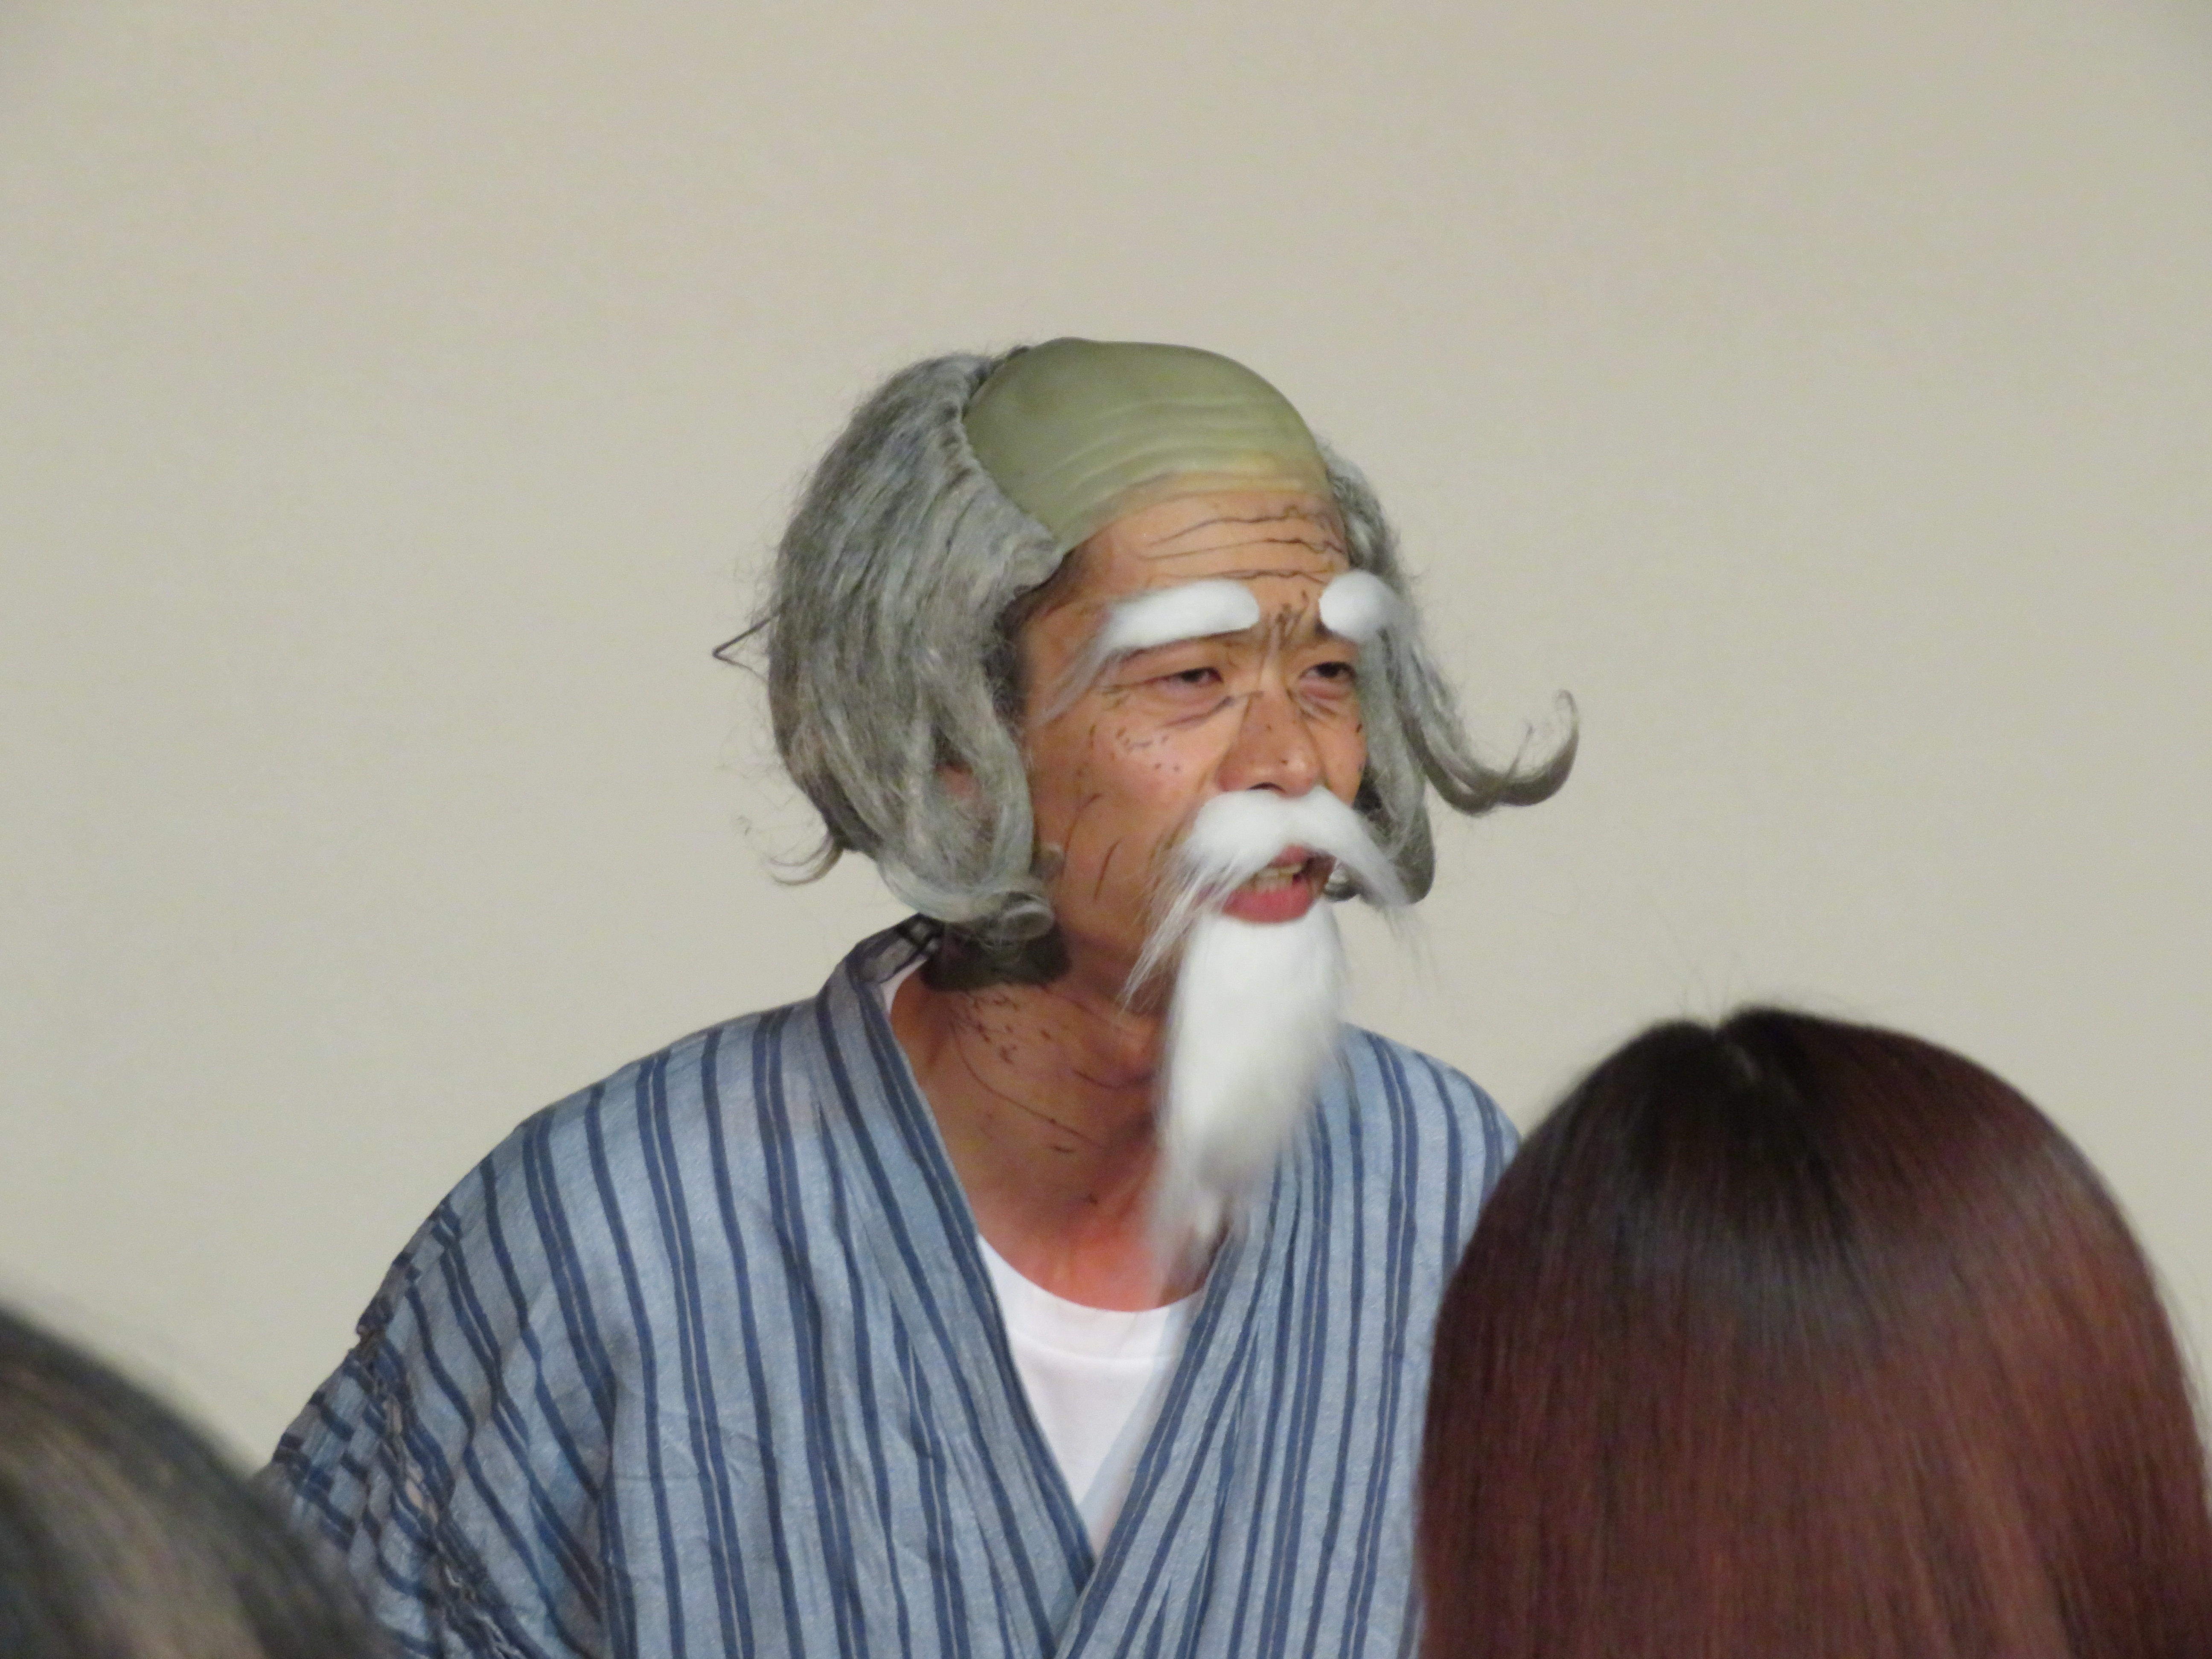 http://news.yoshimoto.co.jp/20170830125344-3b5a04d8f77eb0a39a5f7a54b40ce82cd0d62db9.jpg